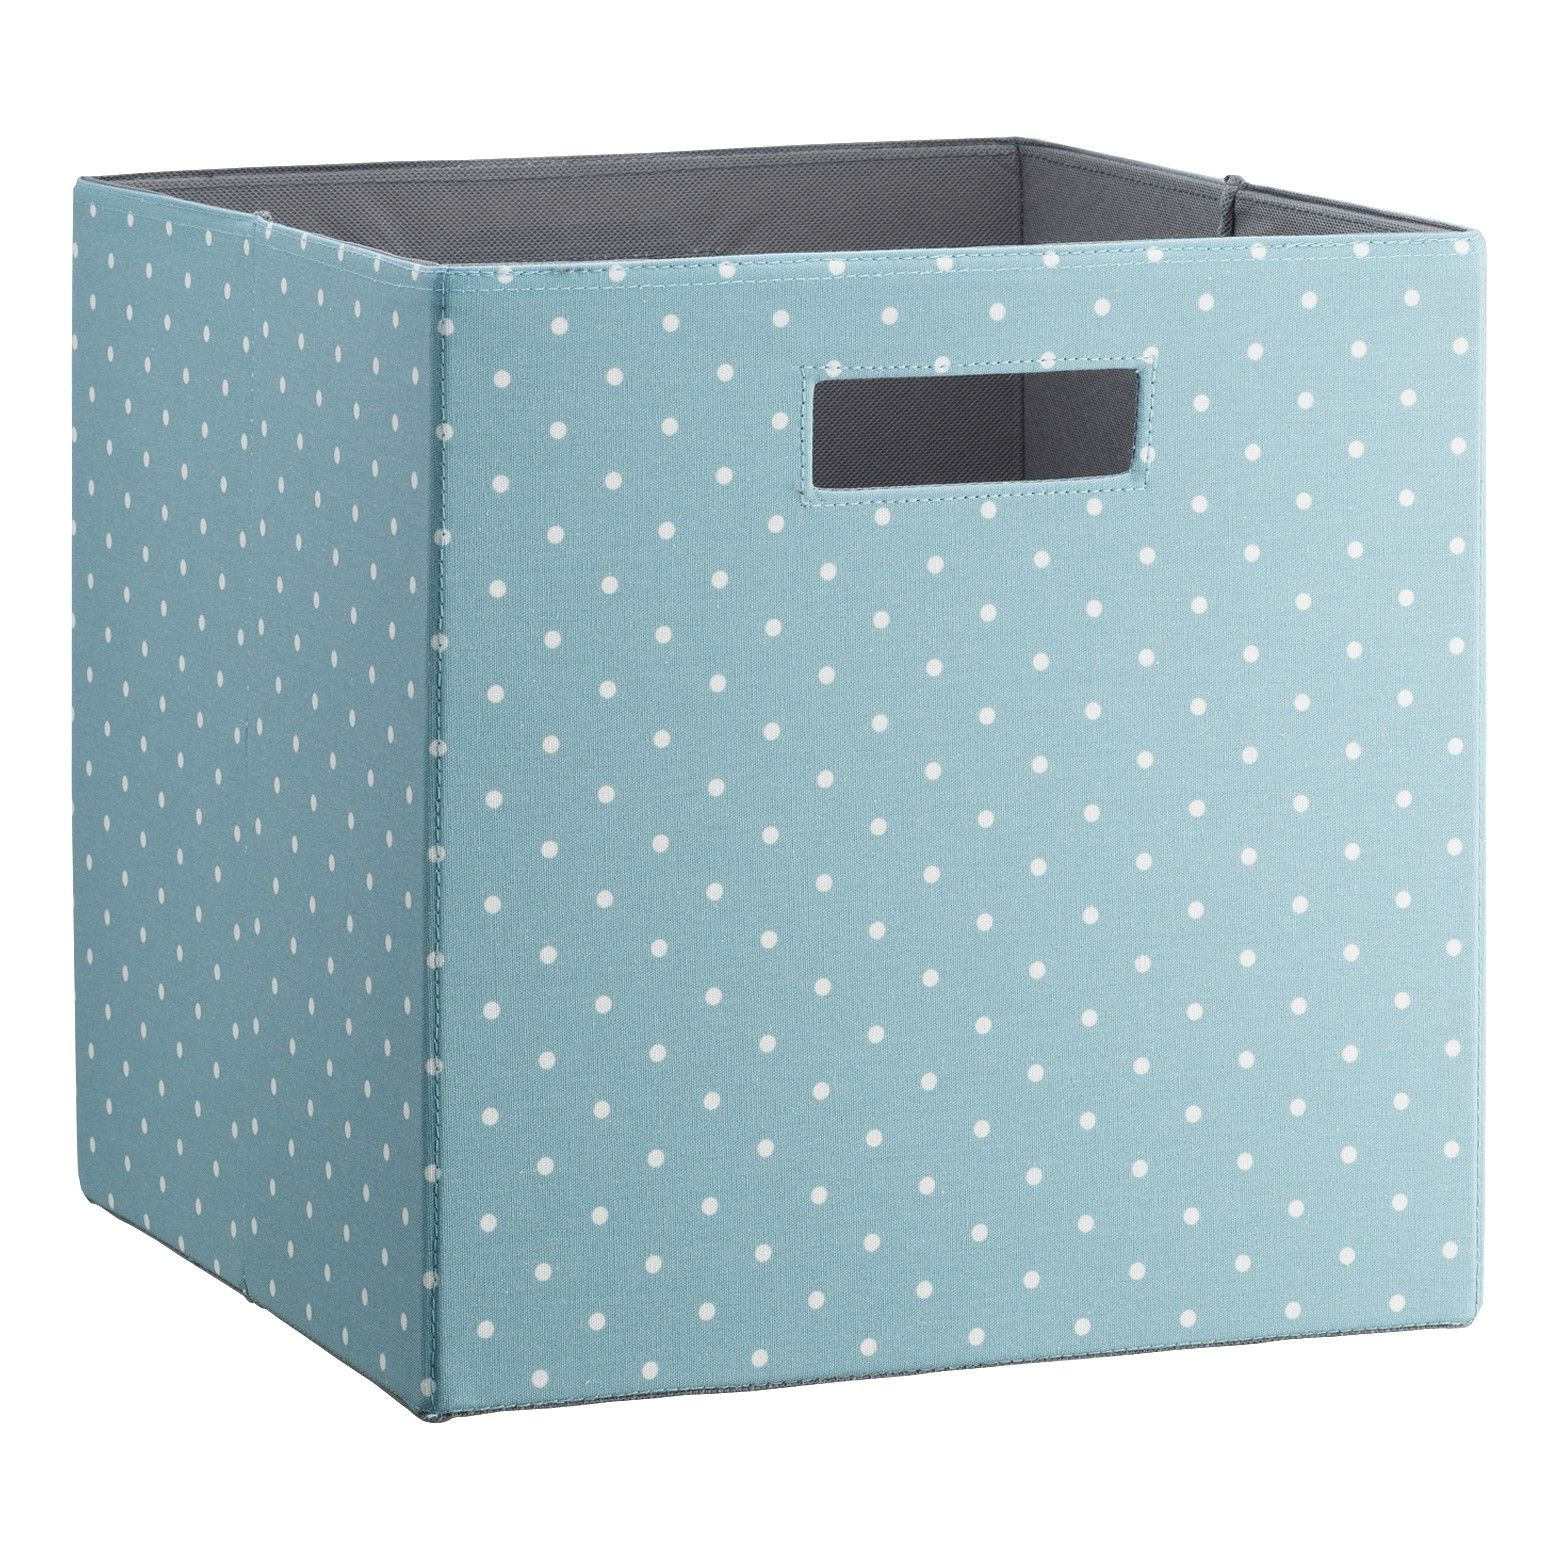 Threshold Fabric Cube Storage Bin (13 )  sc 1 st  Pinterest & Threshold Fabric Cube Storage Bin (13 )   Cube storage Play spaces ...